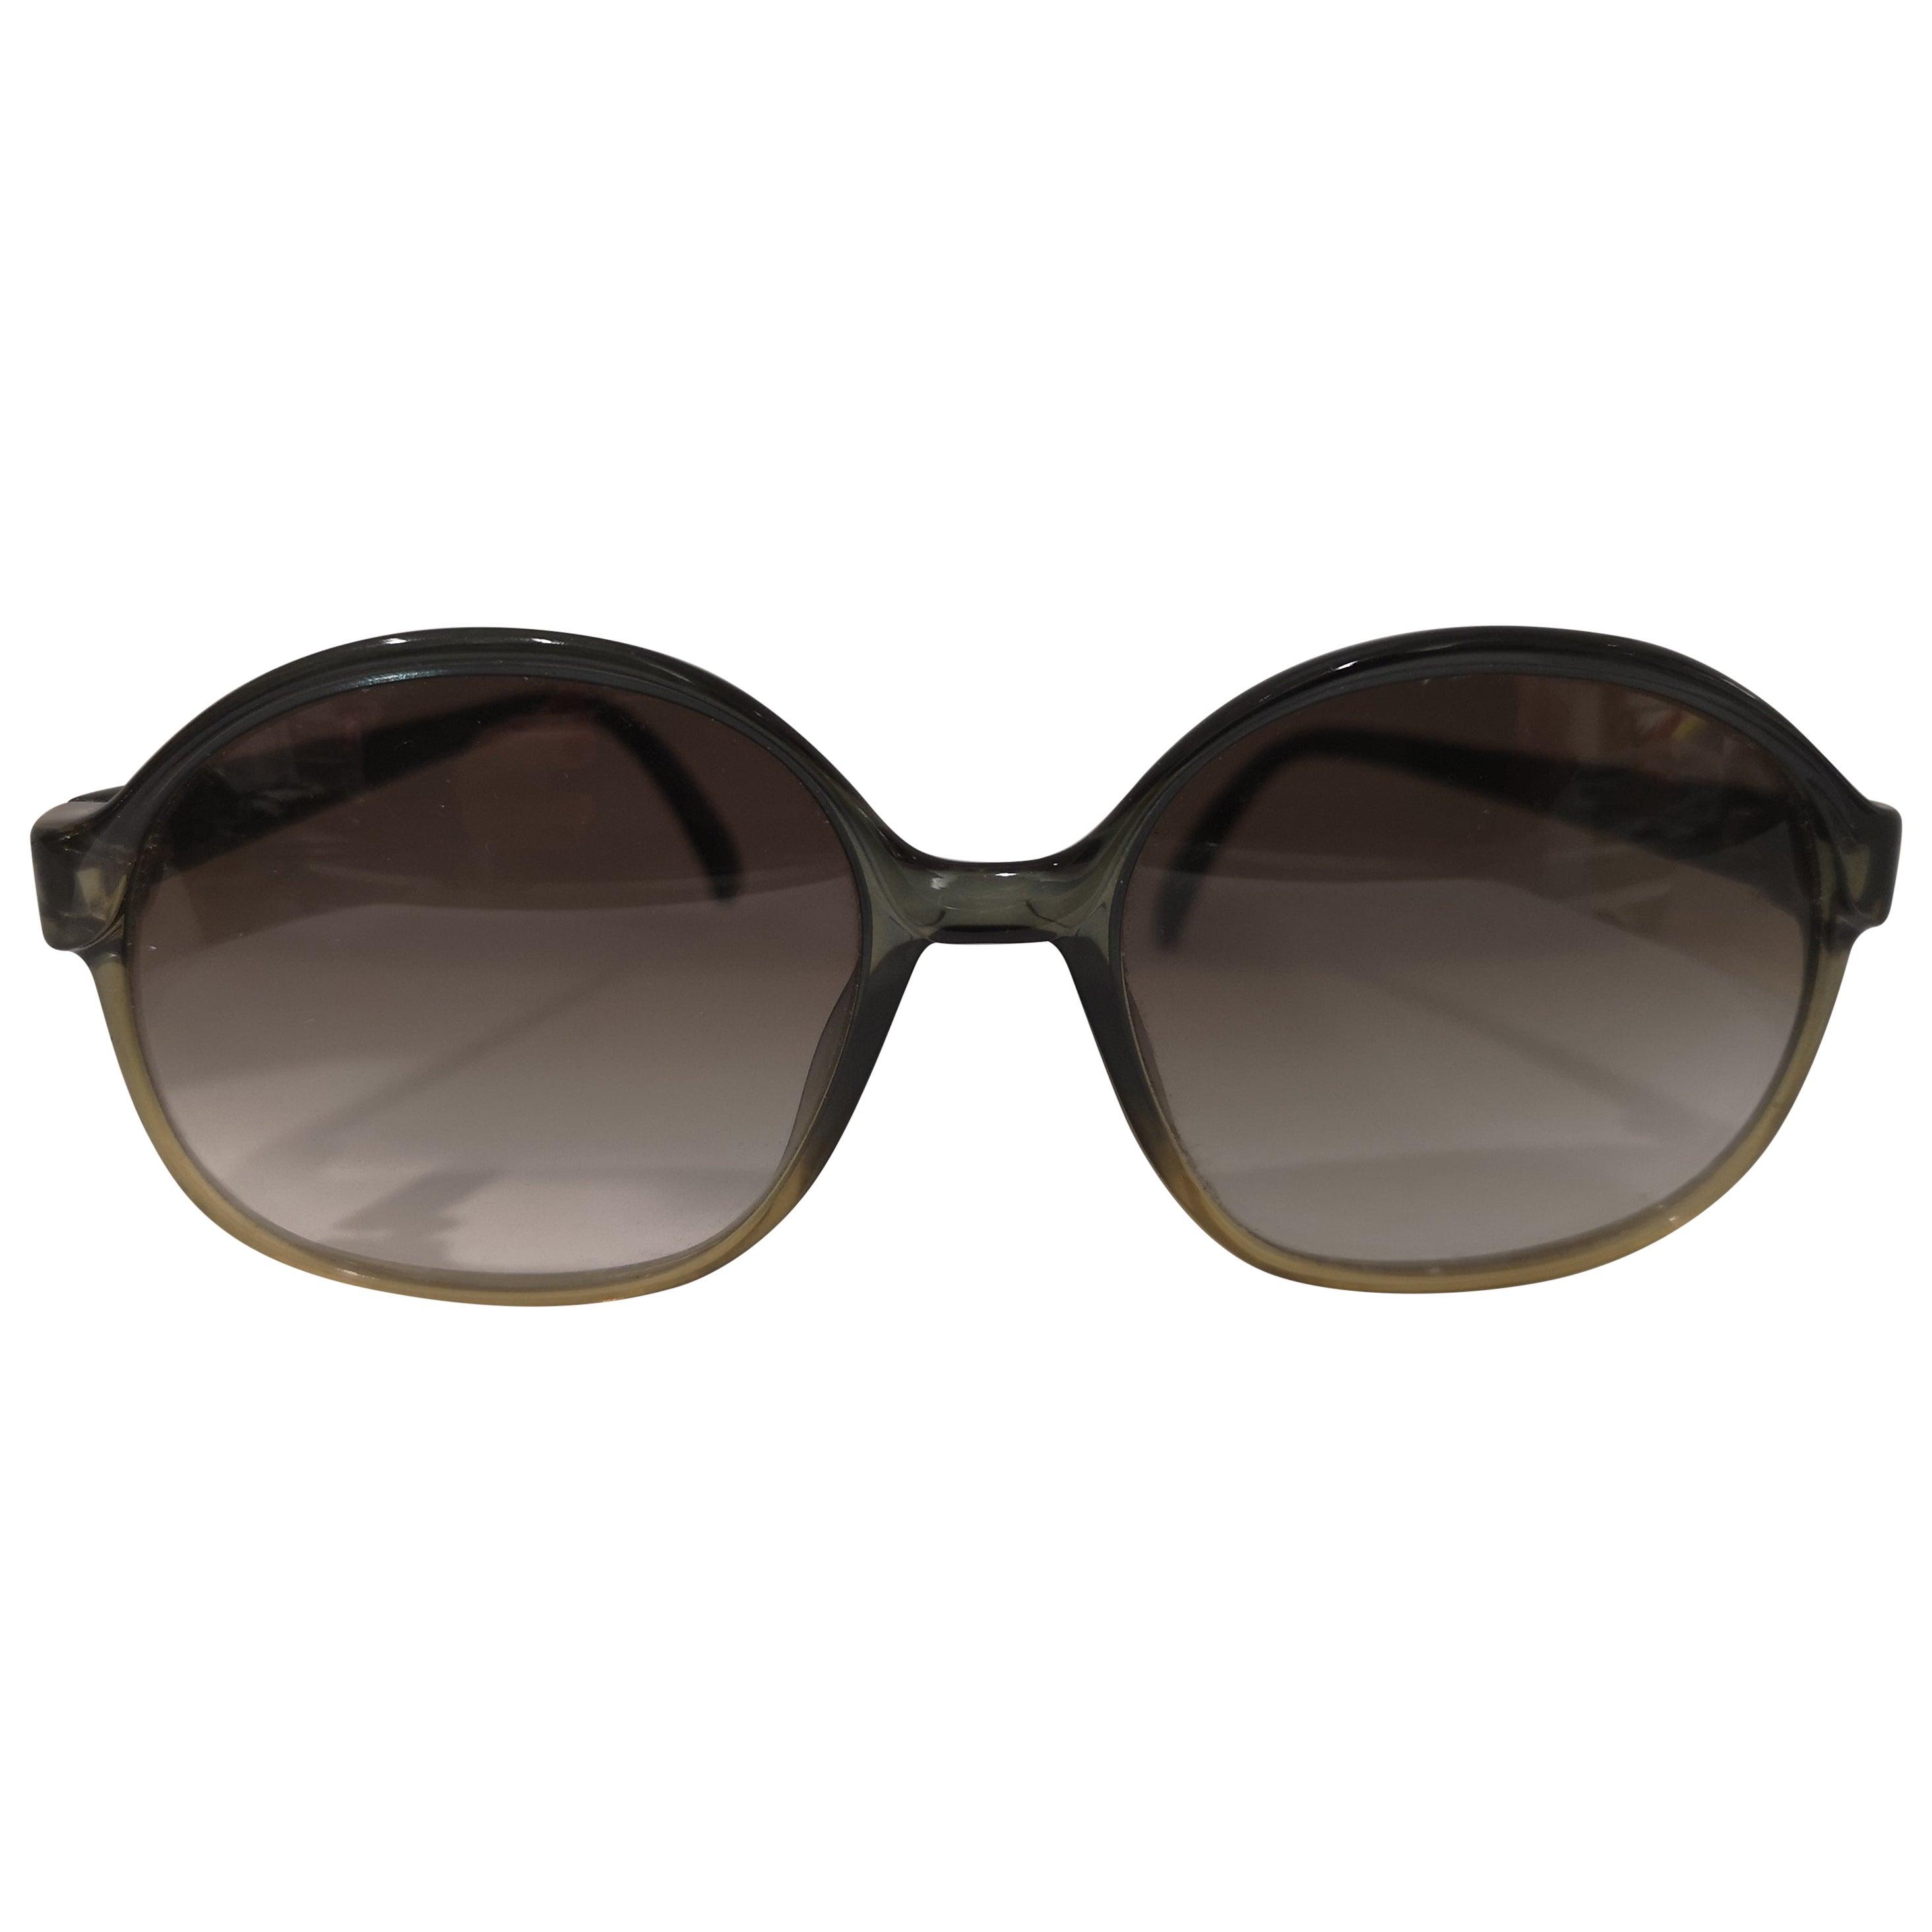 Saphire vintage green sunglasses